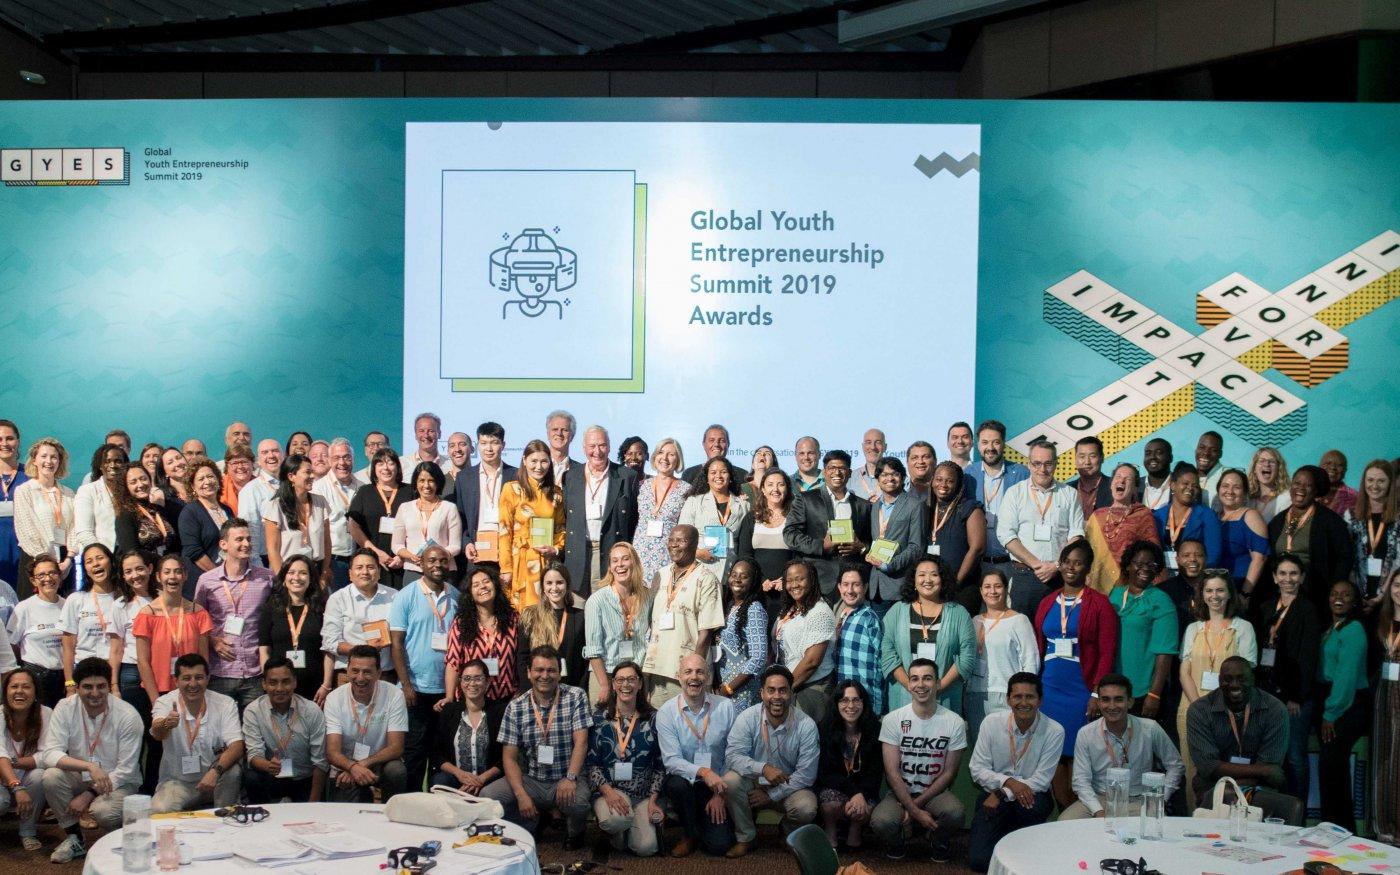 YBI's Global Youth Entrepreneurship Summit: A Week of